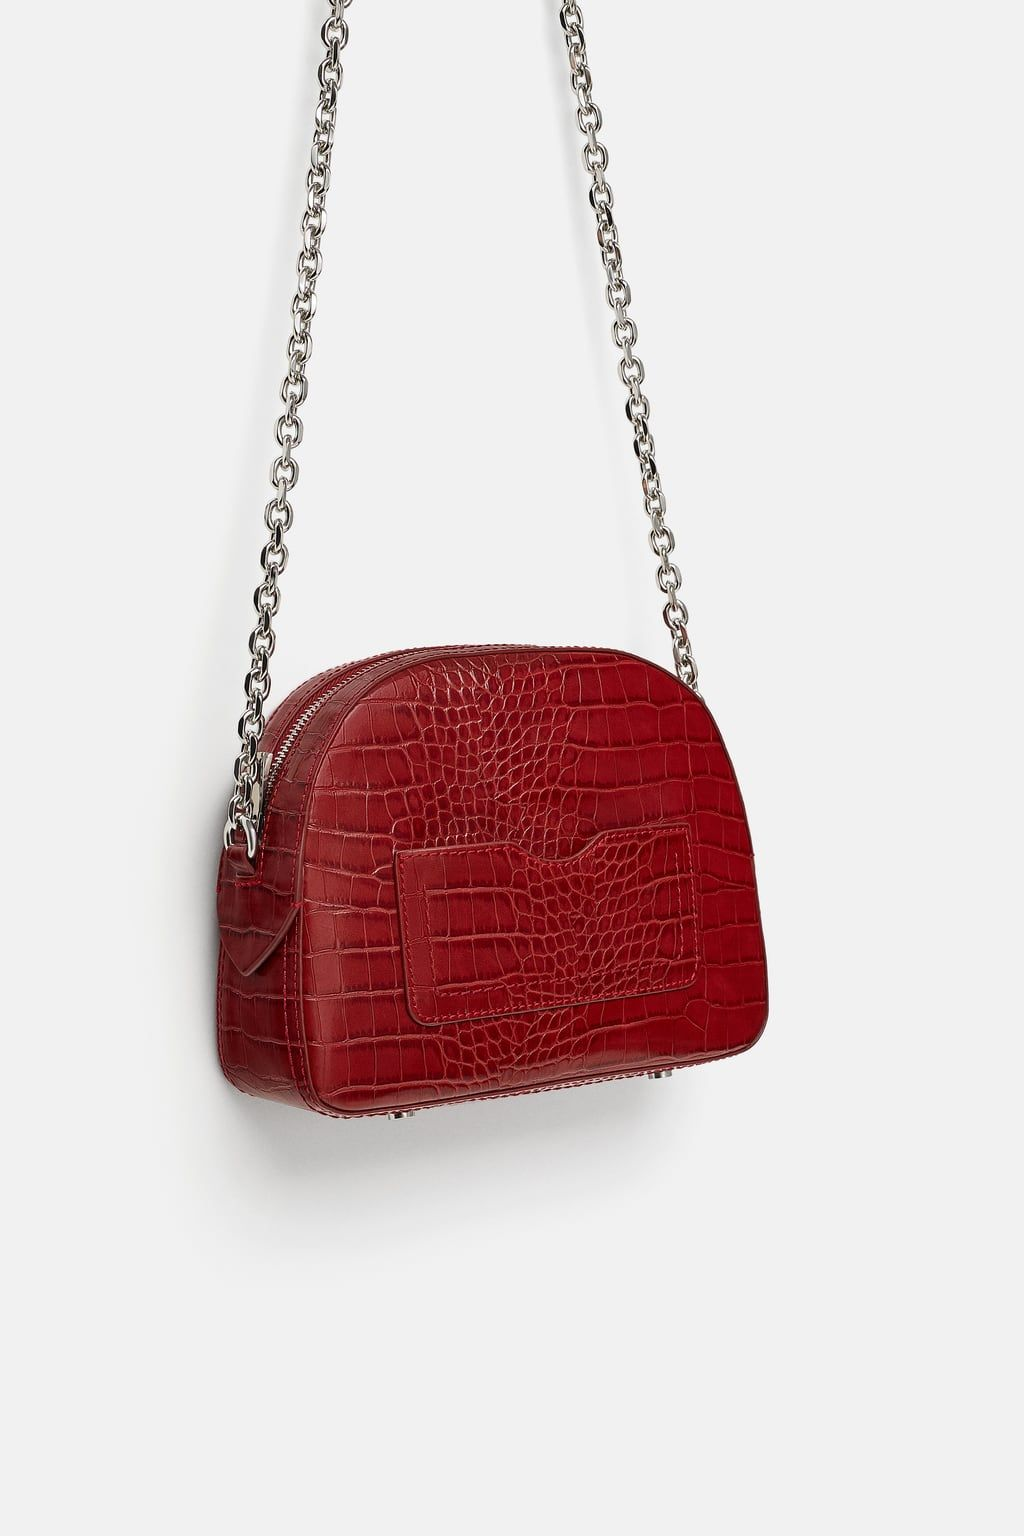 a32a6c869c EMBOSSED ANIMAL PRINT CROSSBODY BAG from Zara